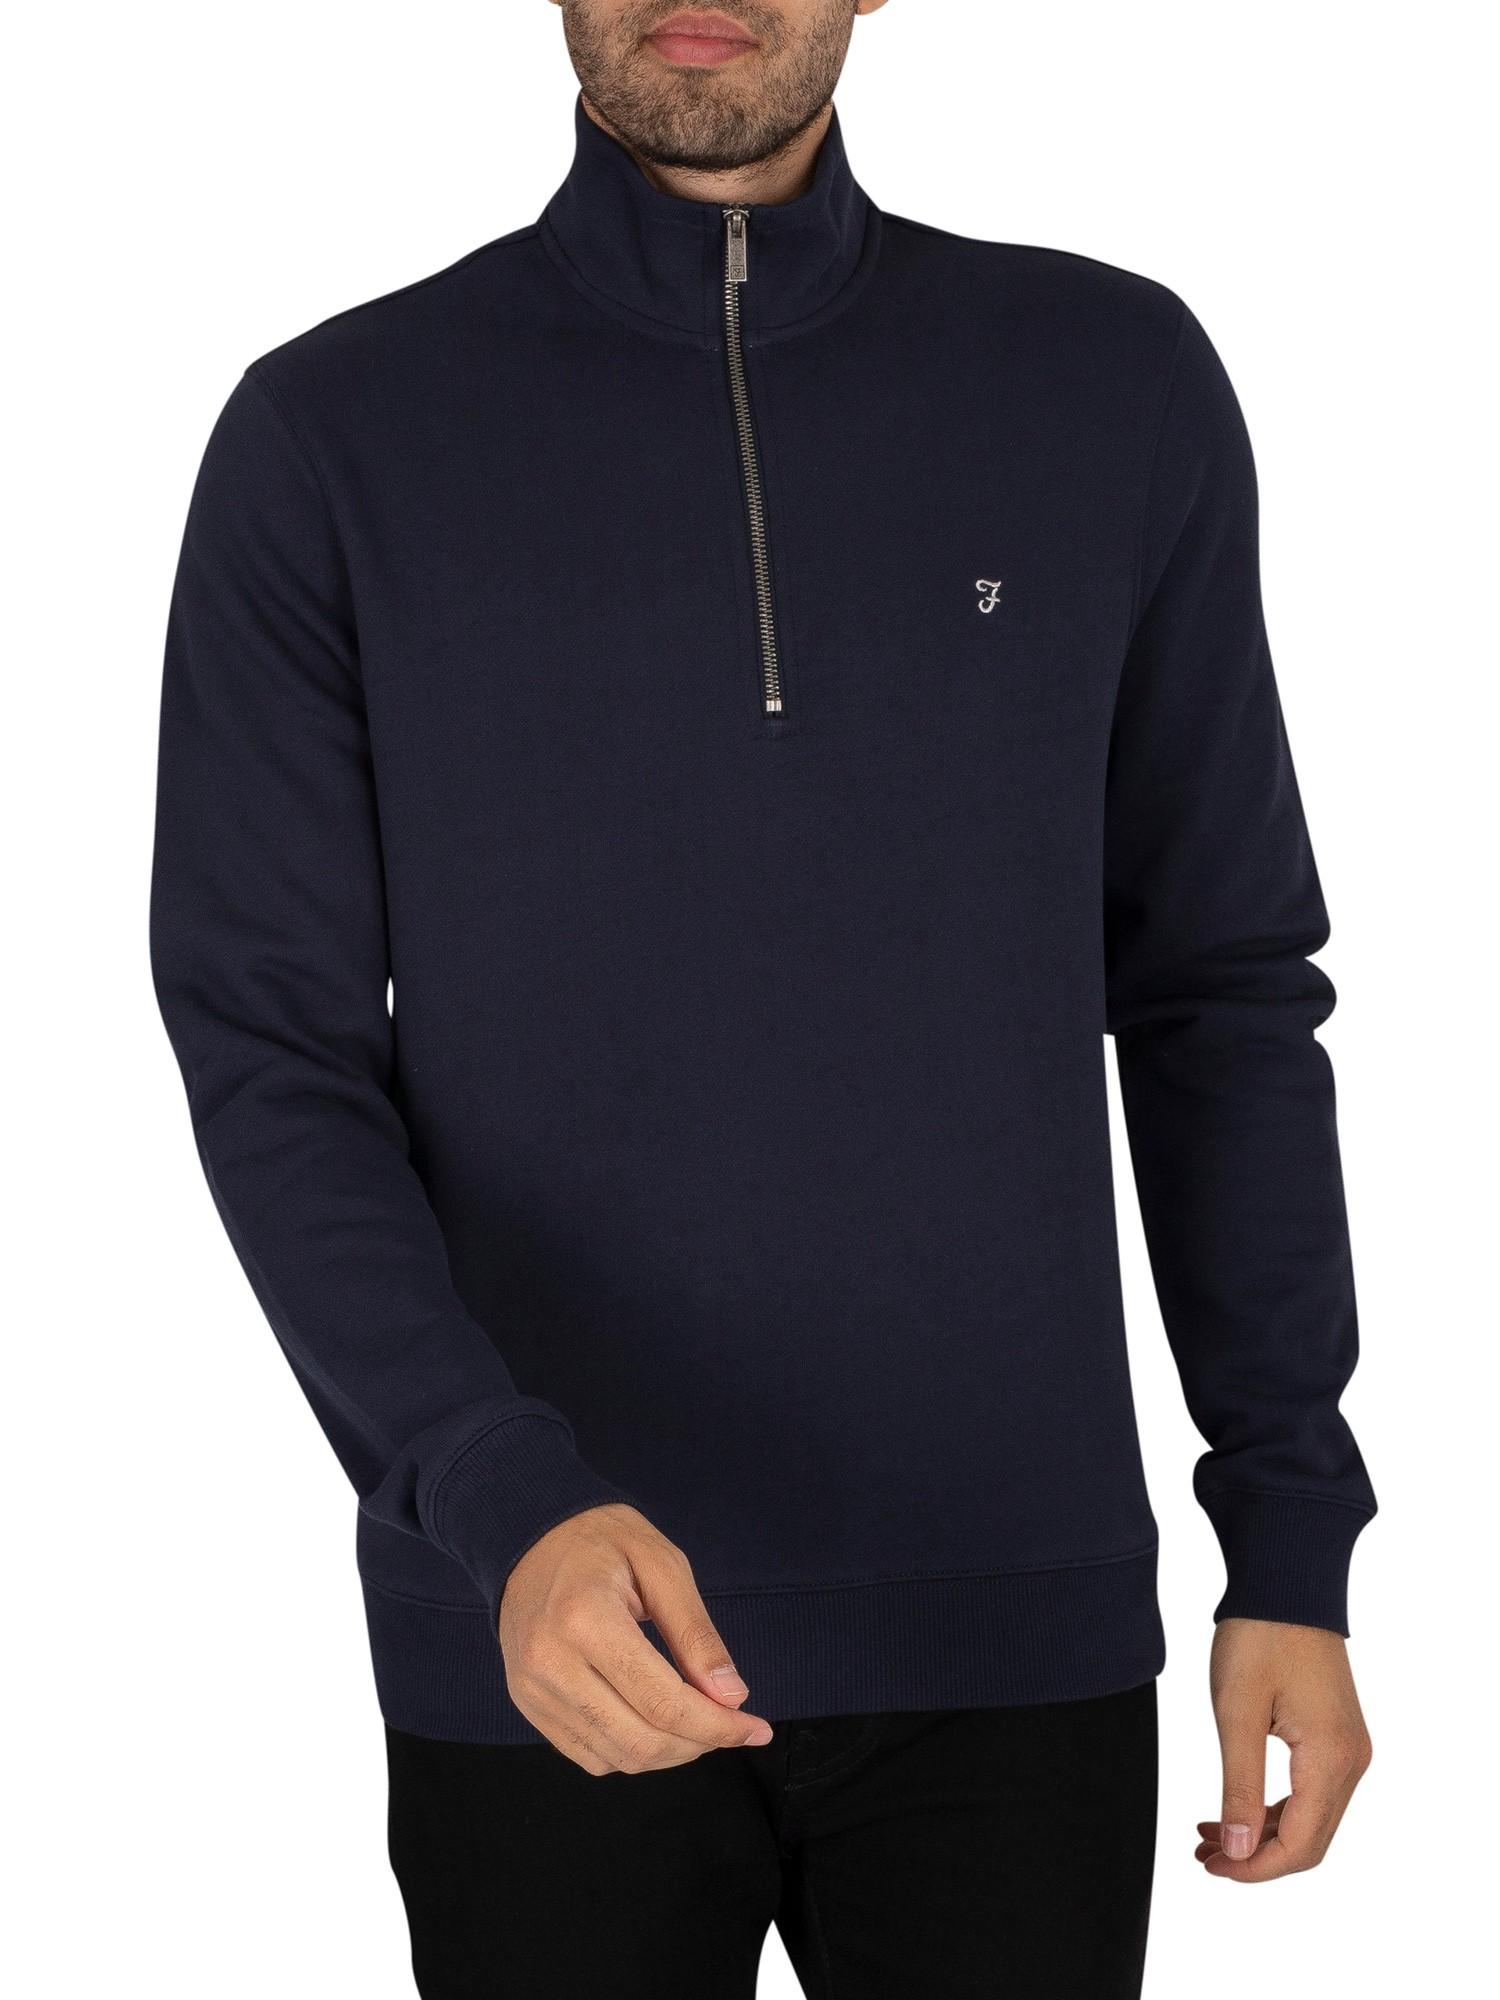 Aintree-14-Zip-Track-Jacket